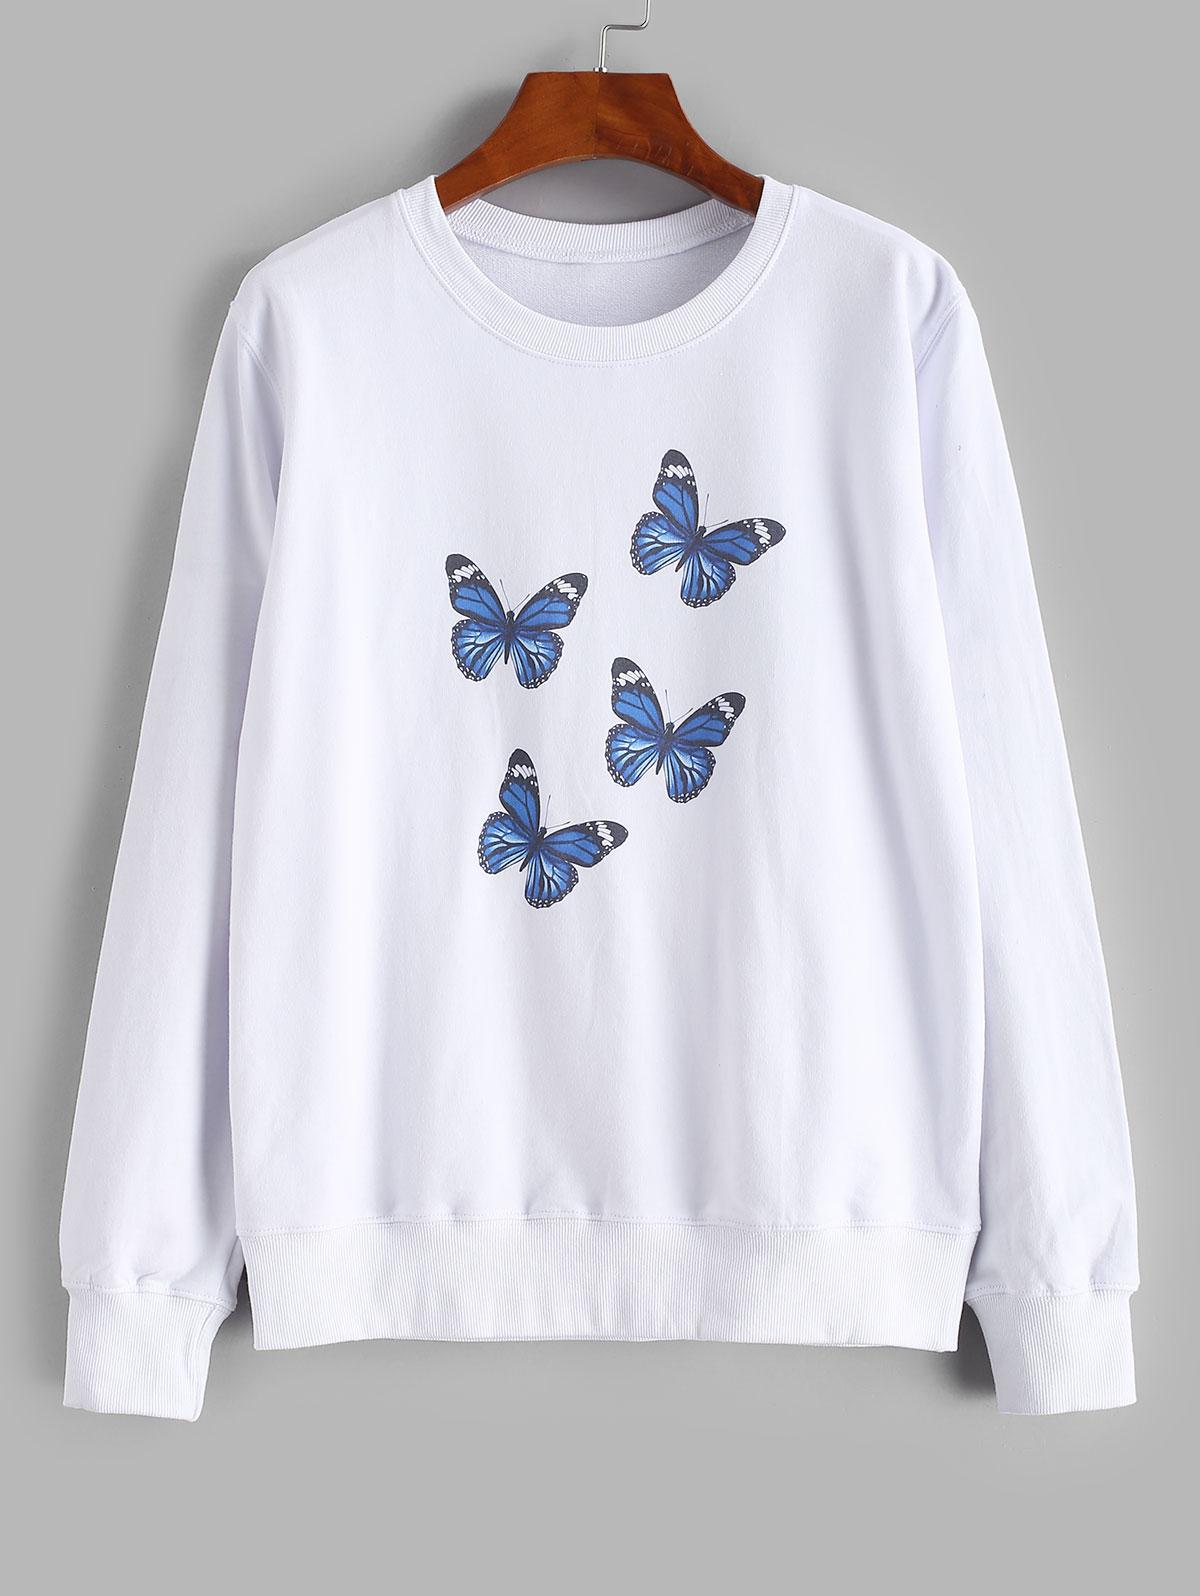 Crew Neck Butterfly Print Sweatshirt